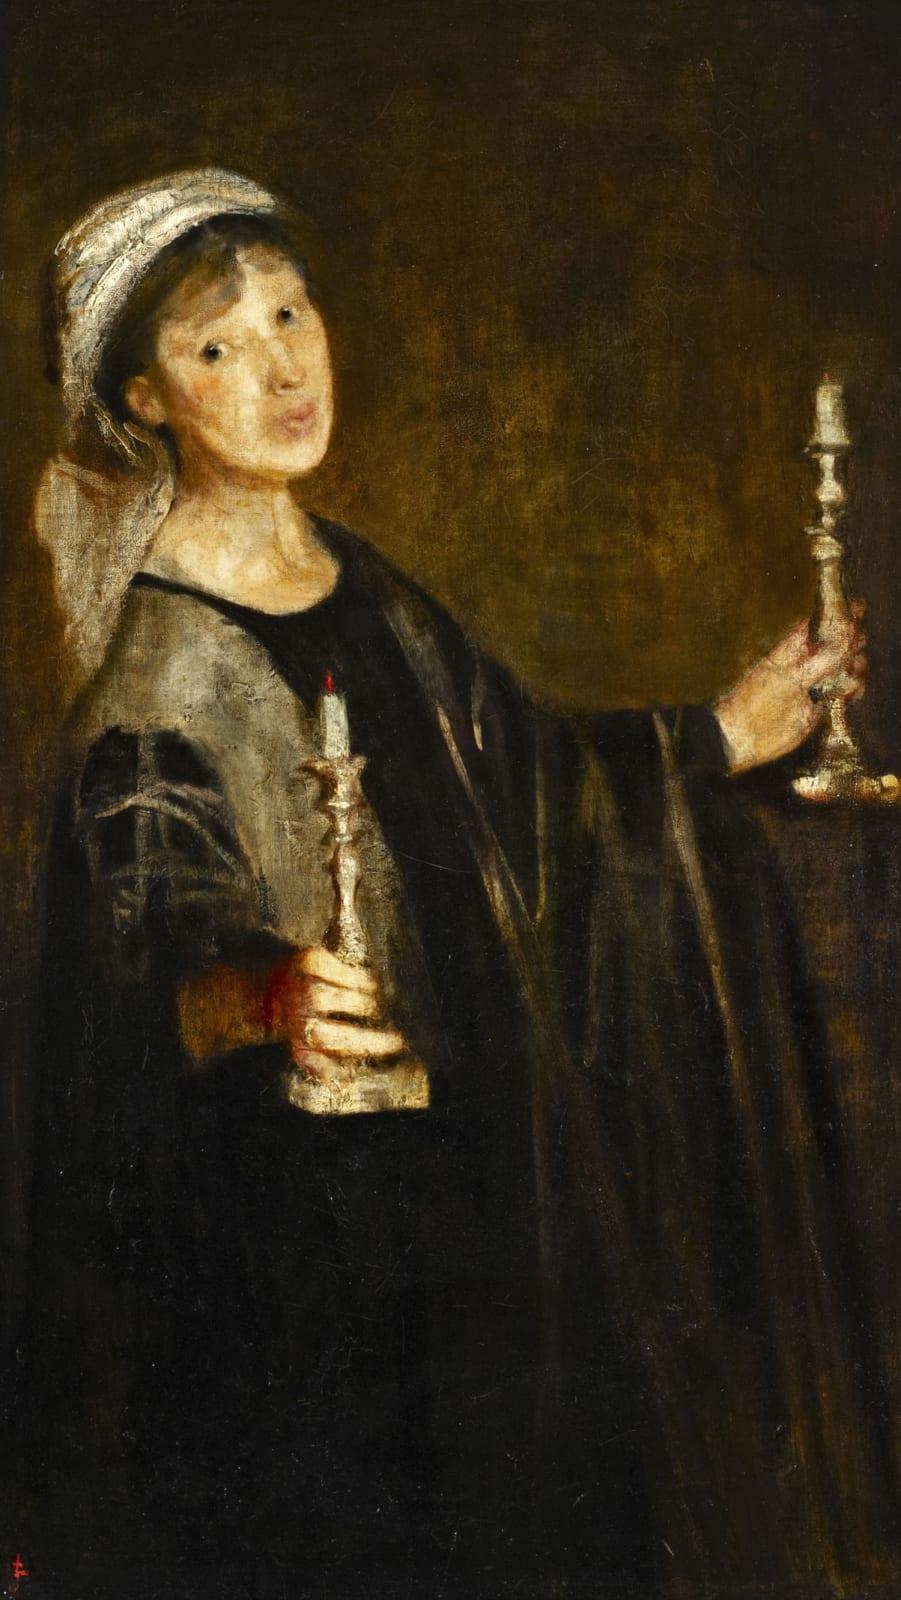 Lily Delissa Joseph (1863-1940) Self Portrait with Candles c.1906 Oil on canvas 105.5 x 59.5 cm Ben Uri Collection